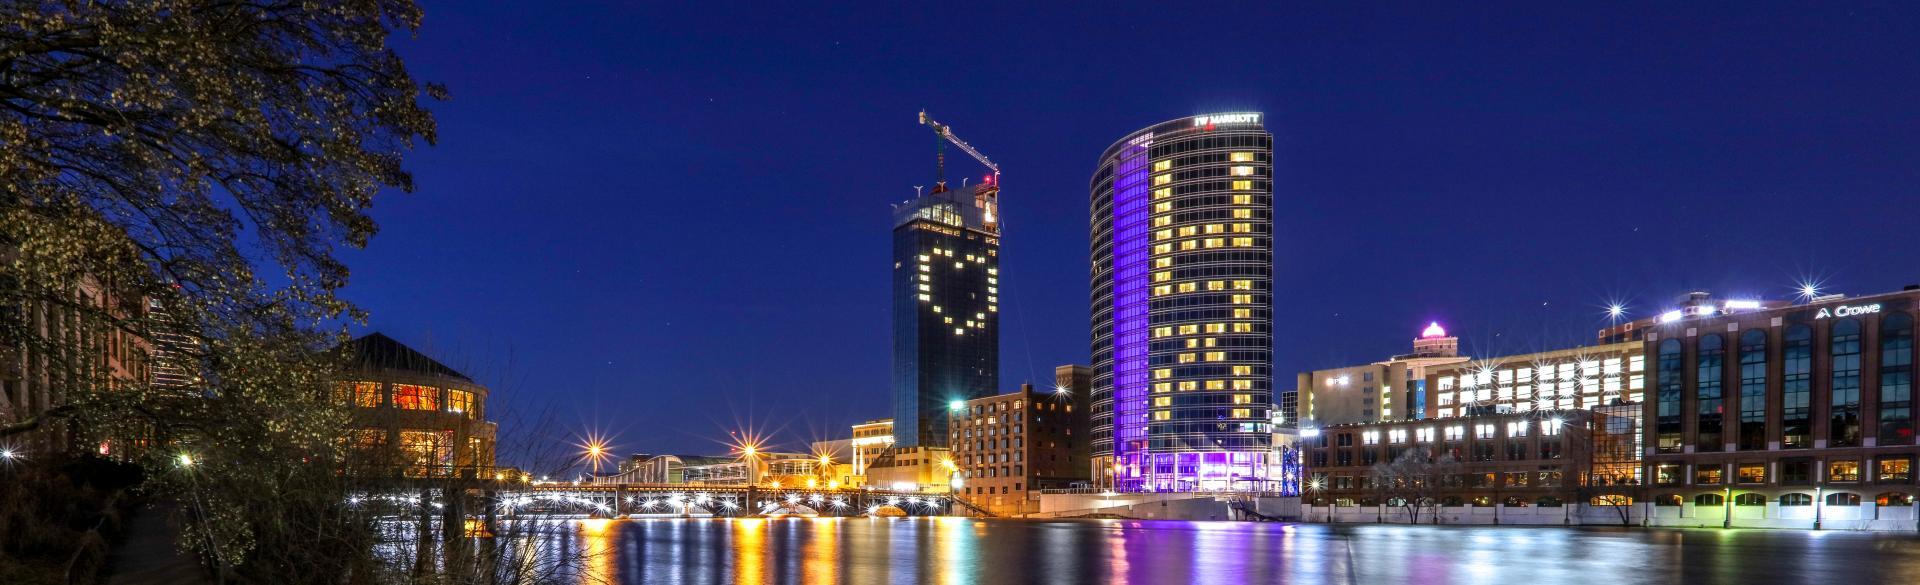 Grand Rapids City Skyline at Night